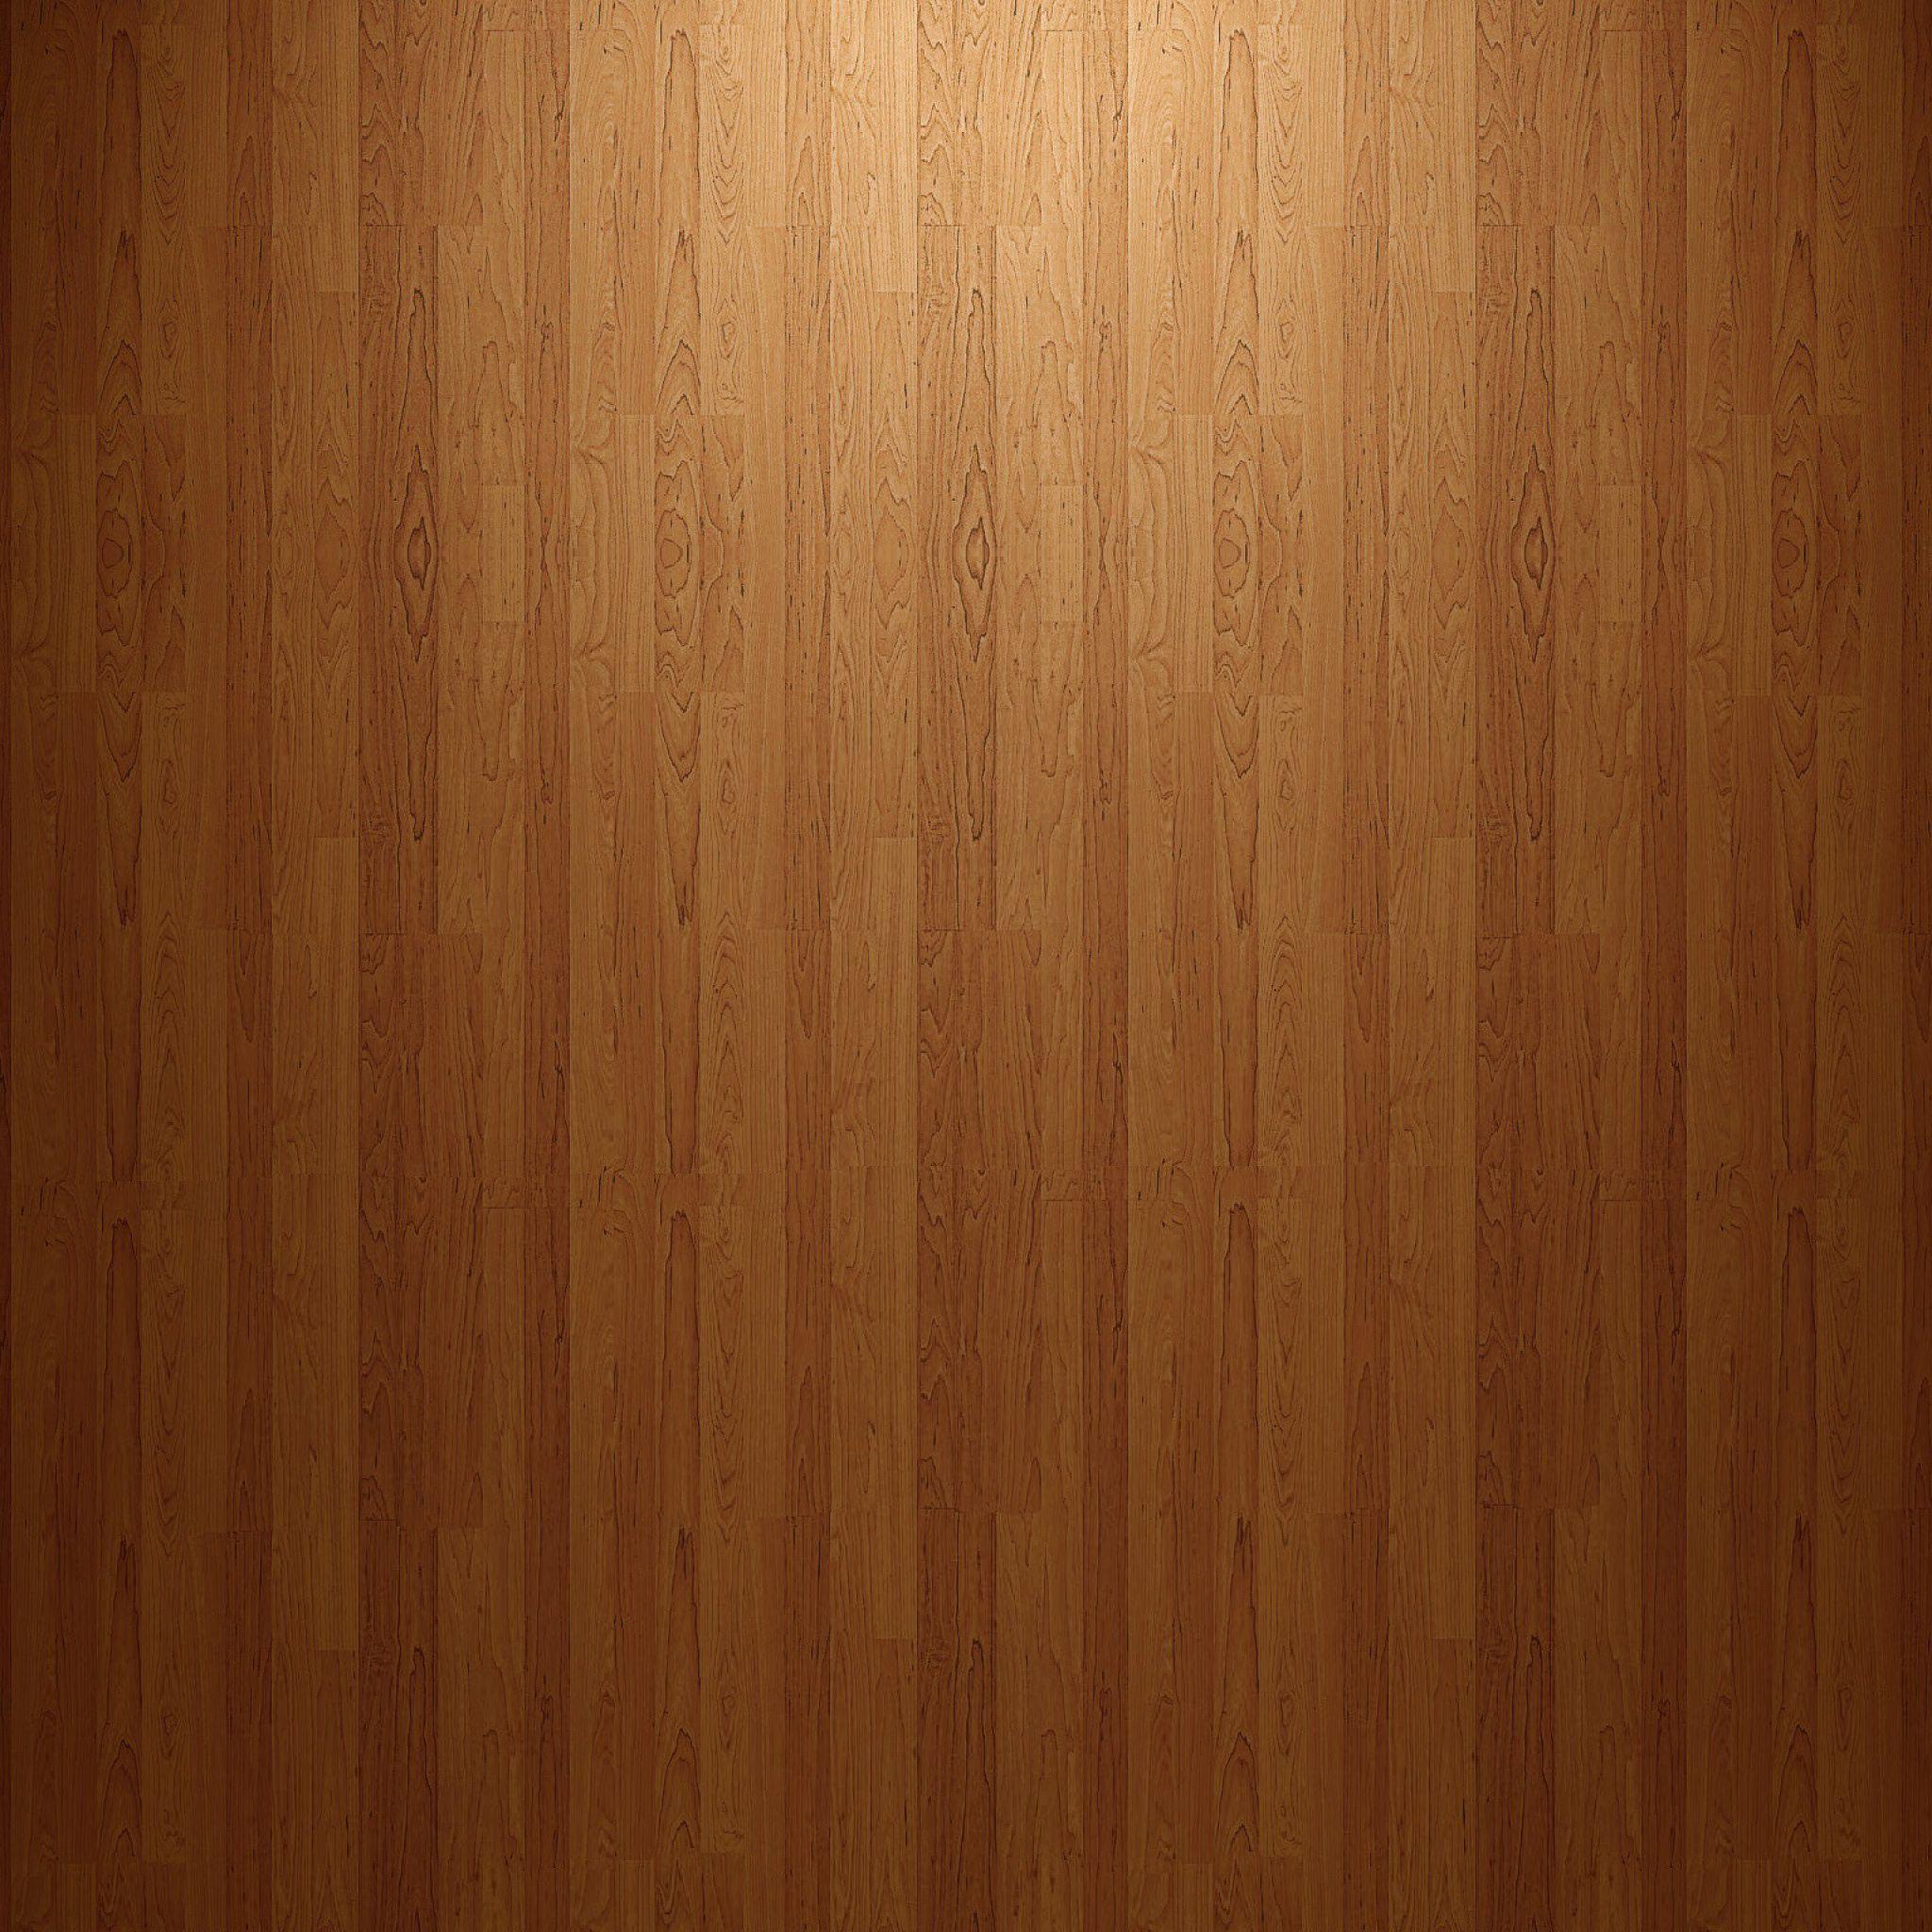 Bamboo design ipad air 2 wallpapers ipad air 2 wallpapers - Most Popular Ipad Wallpapers Free Ipad Air Wallpapers Ipad Mini